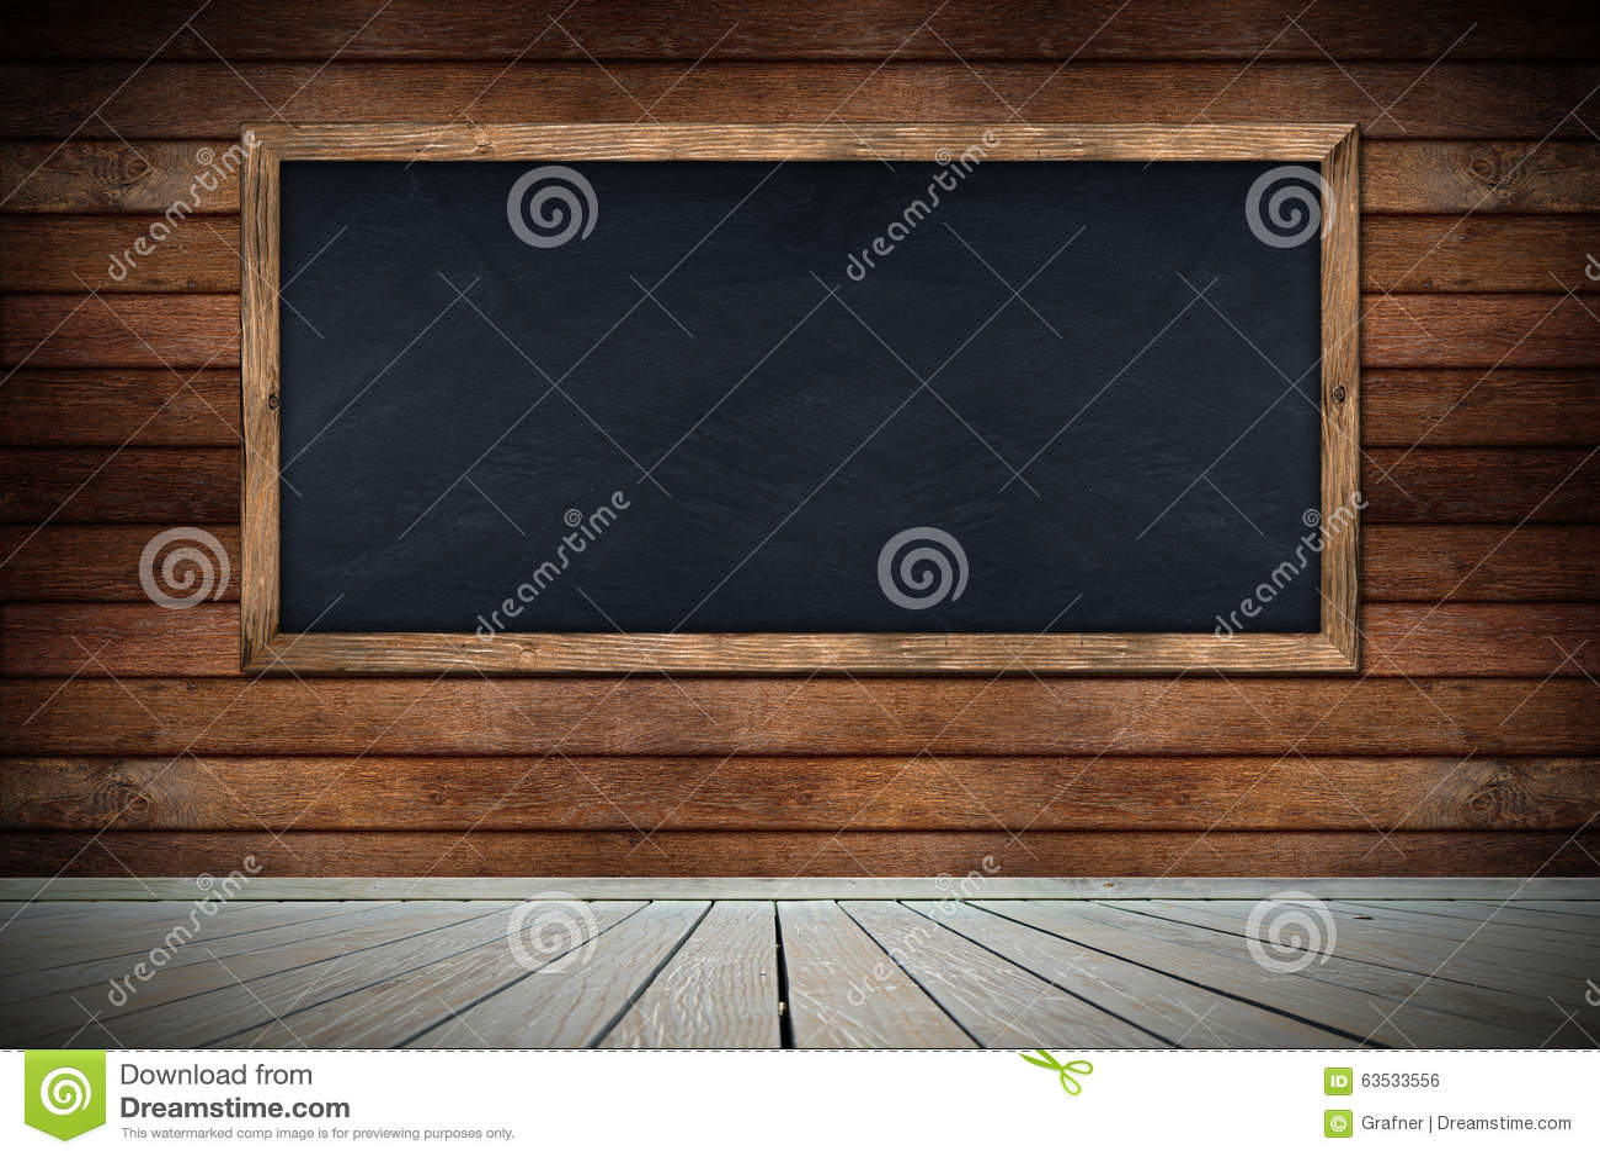 innovative wooden floor with a blackboard 14